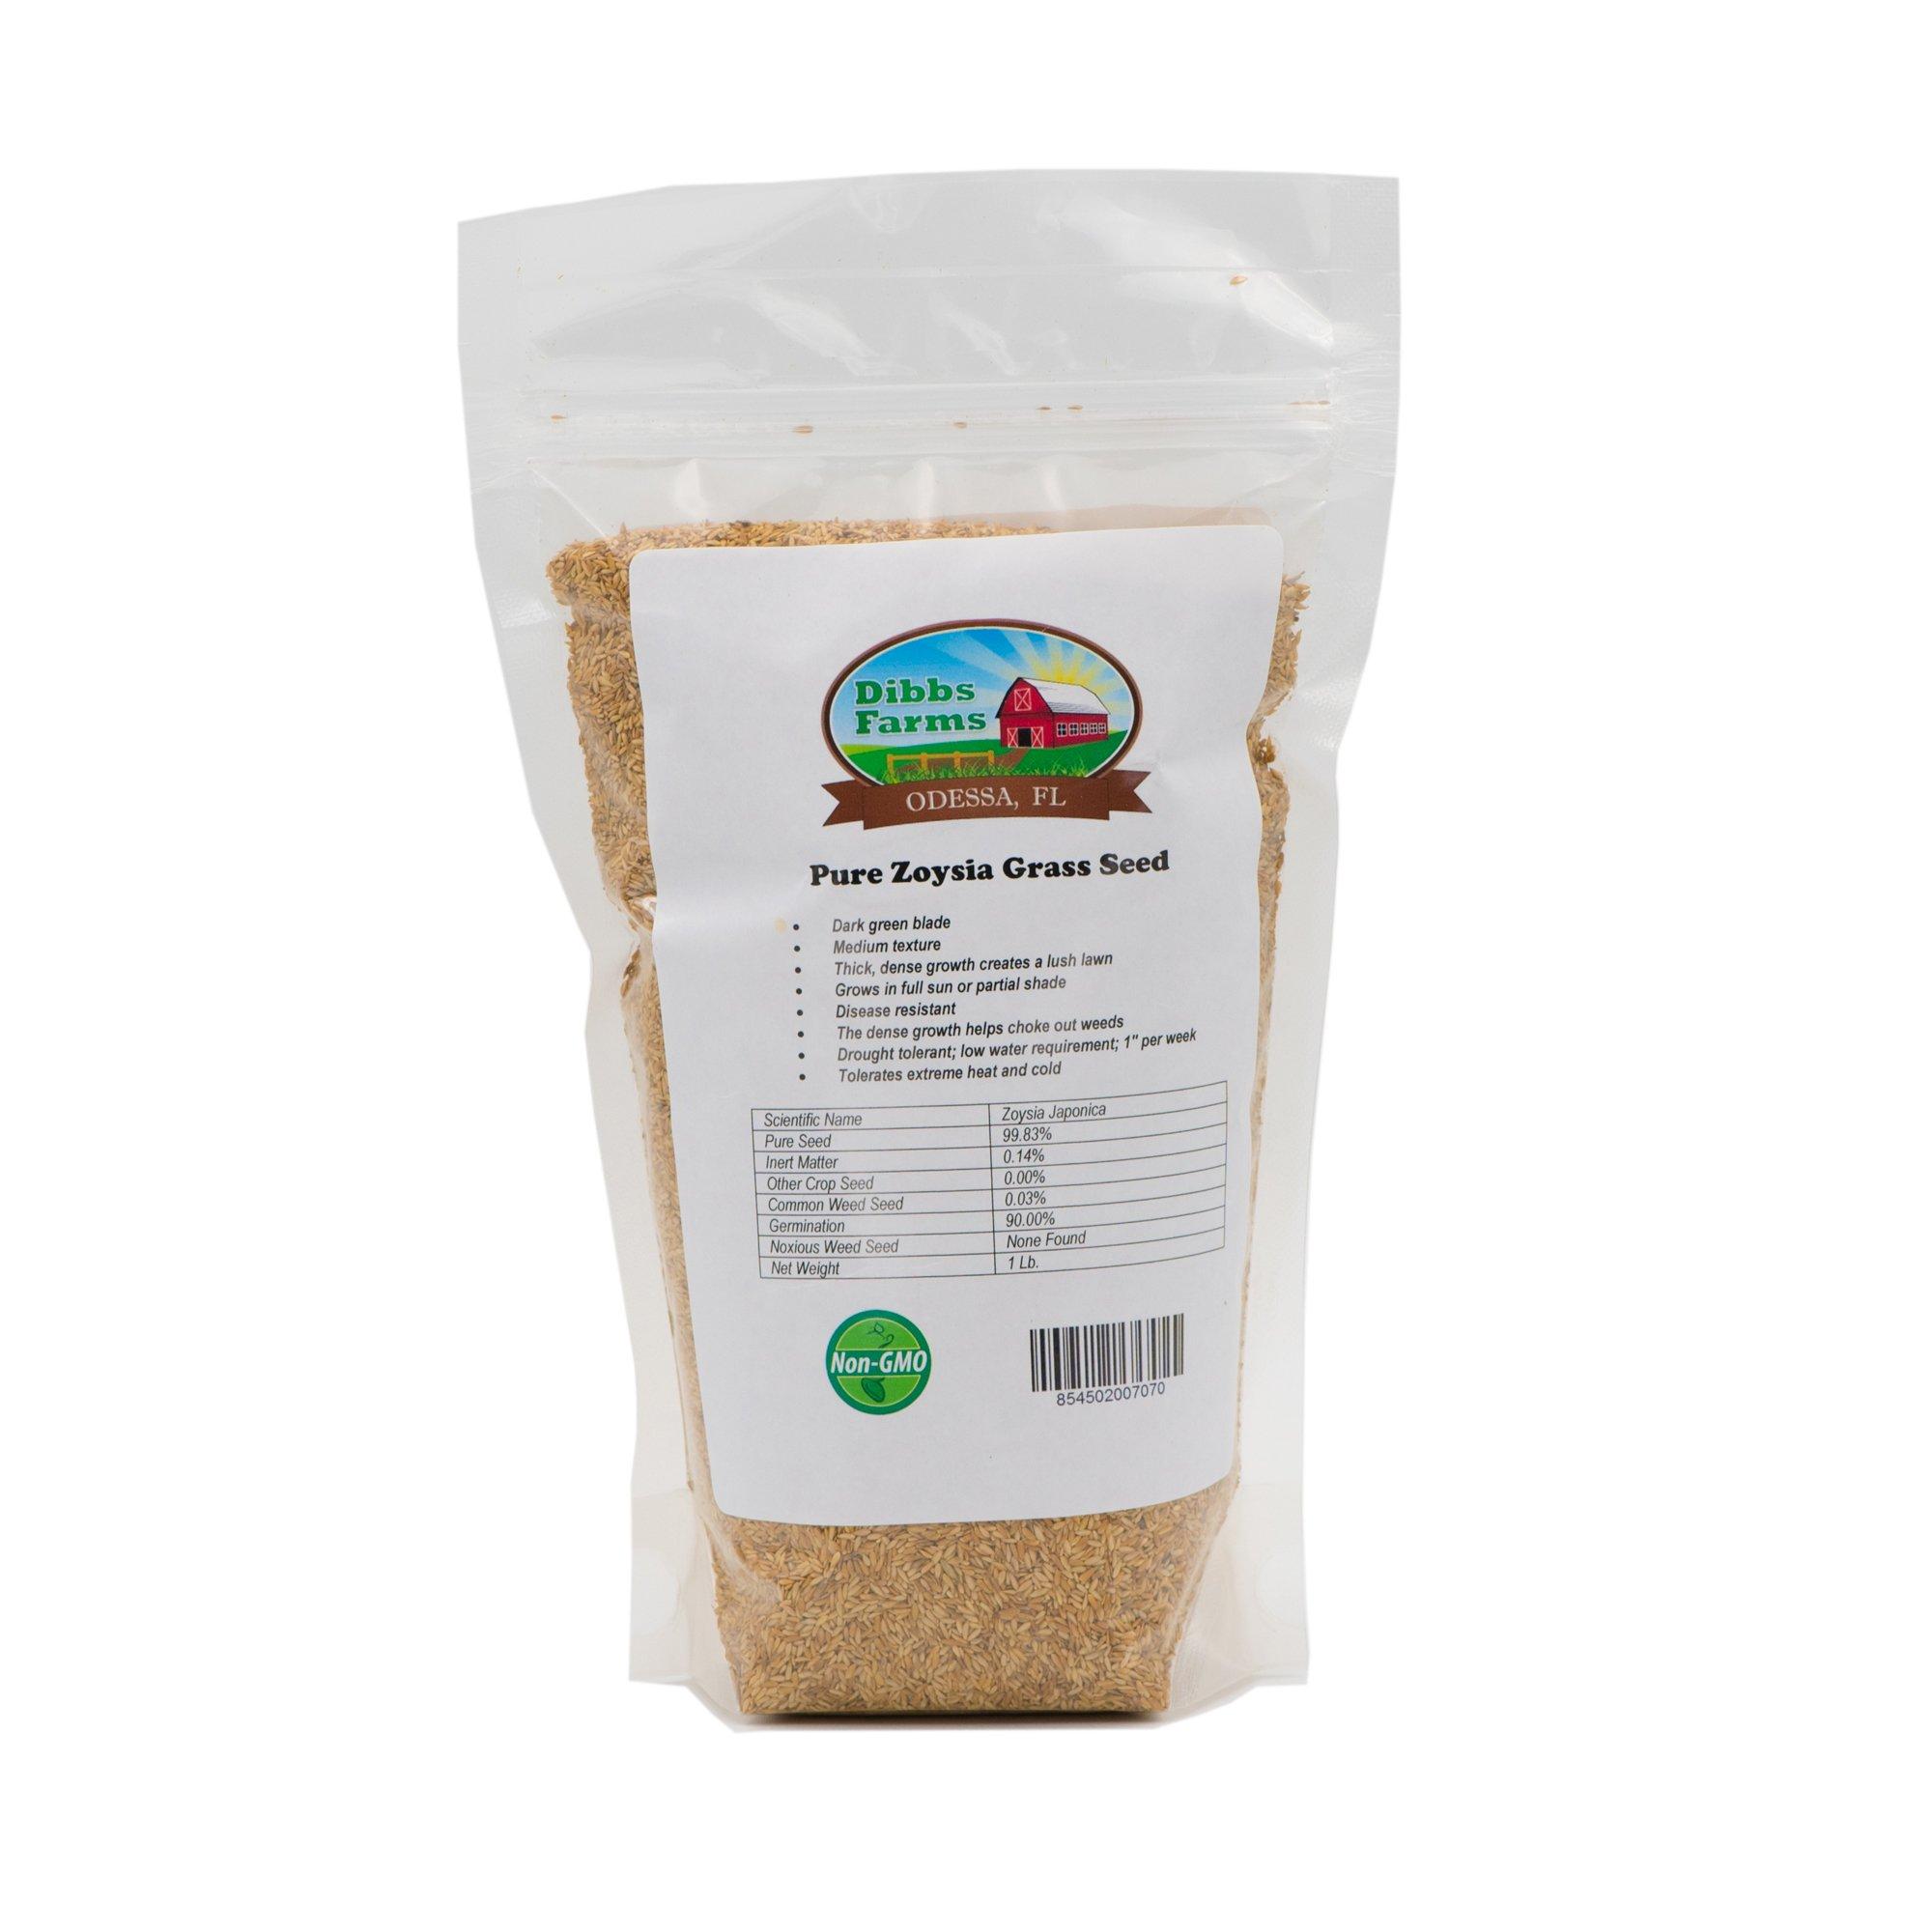 Dibbs Farms Pure Zoysia Grass Seeds - 1 Lb. by Dibbs Farms